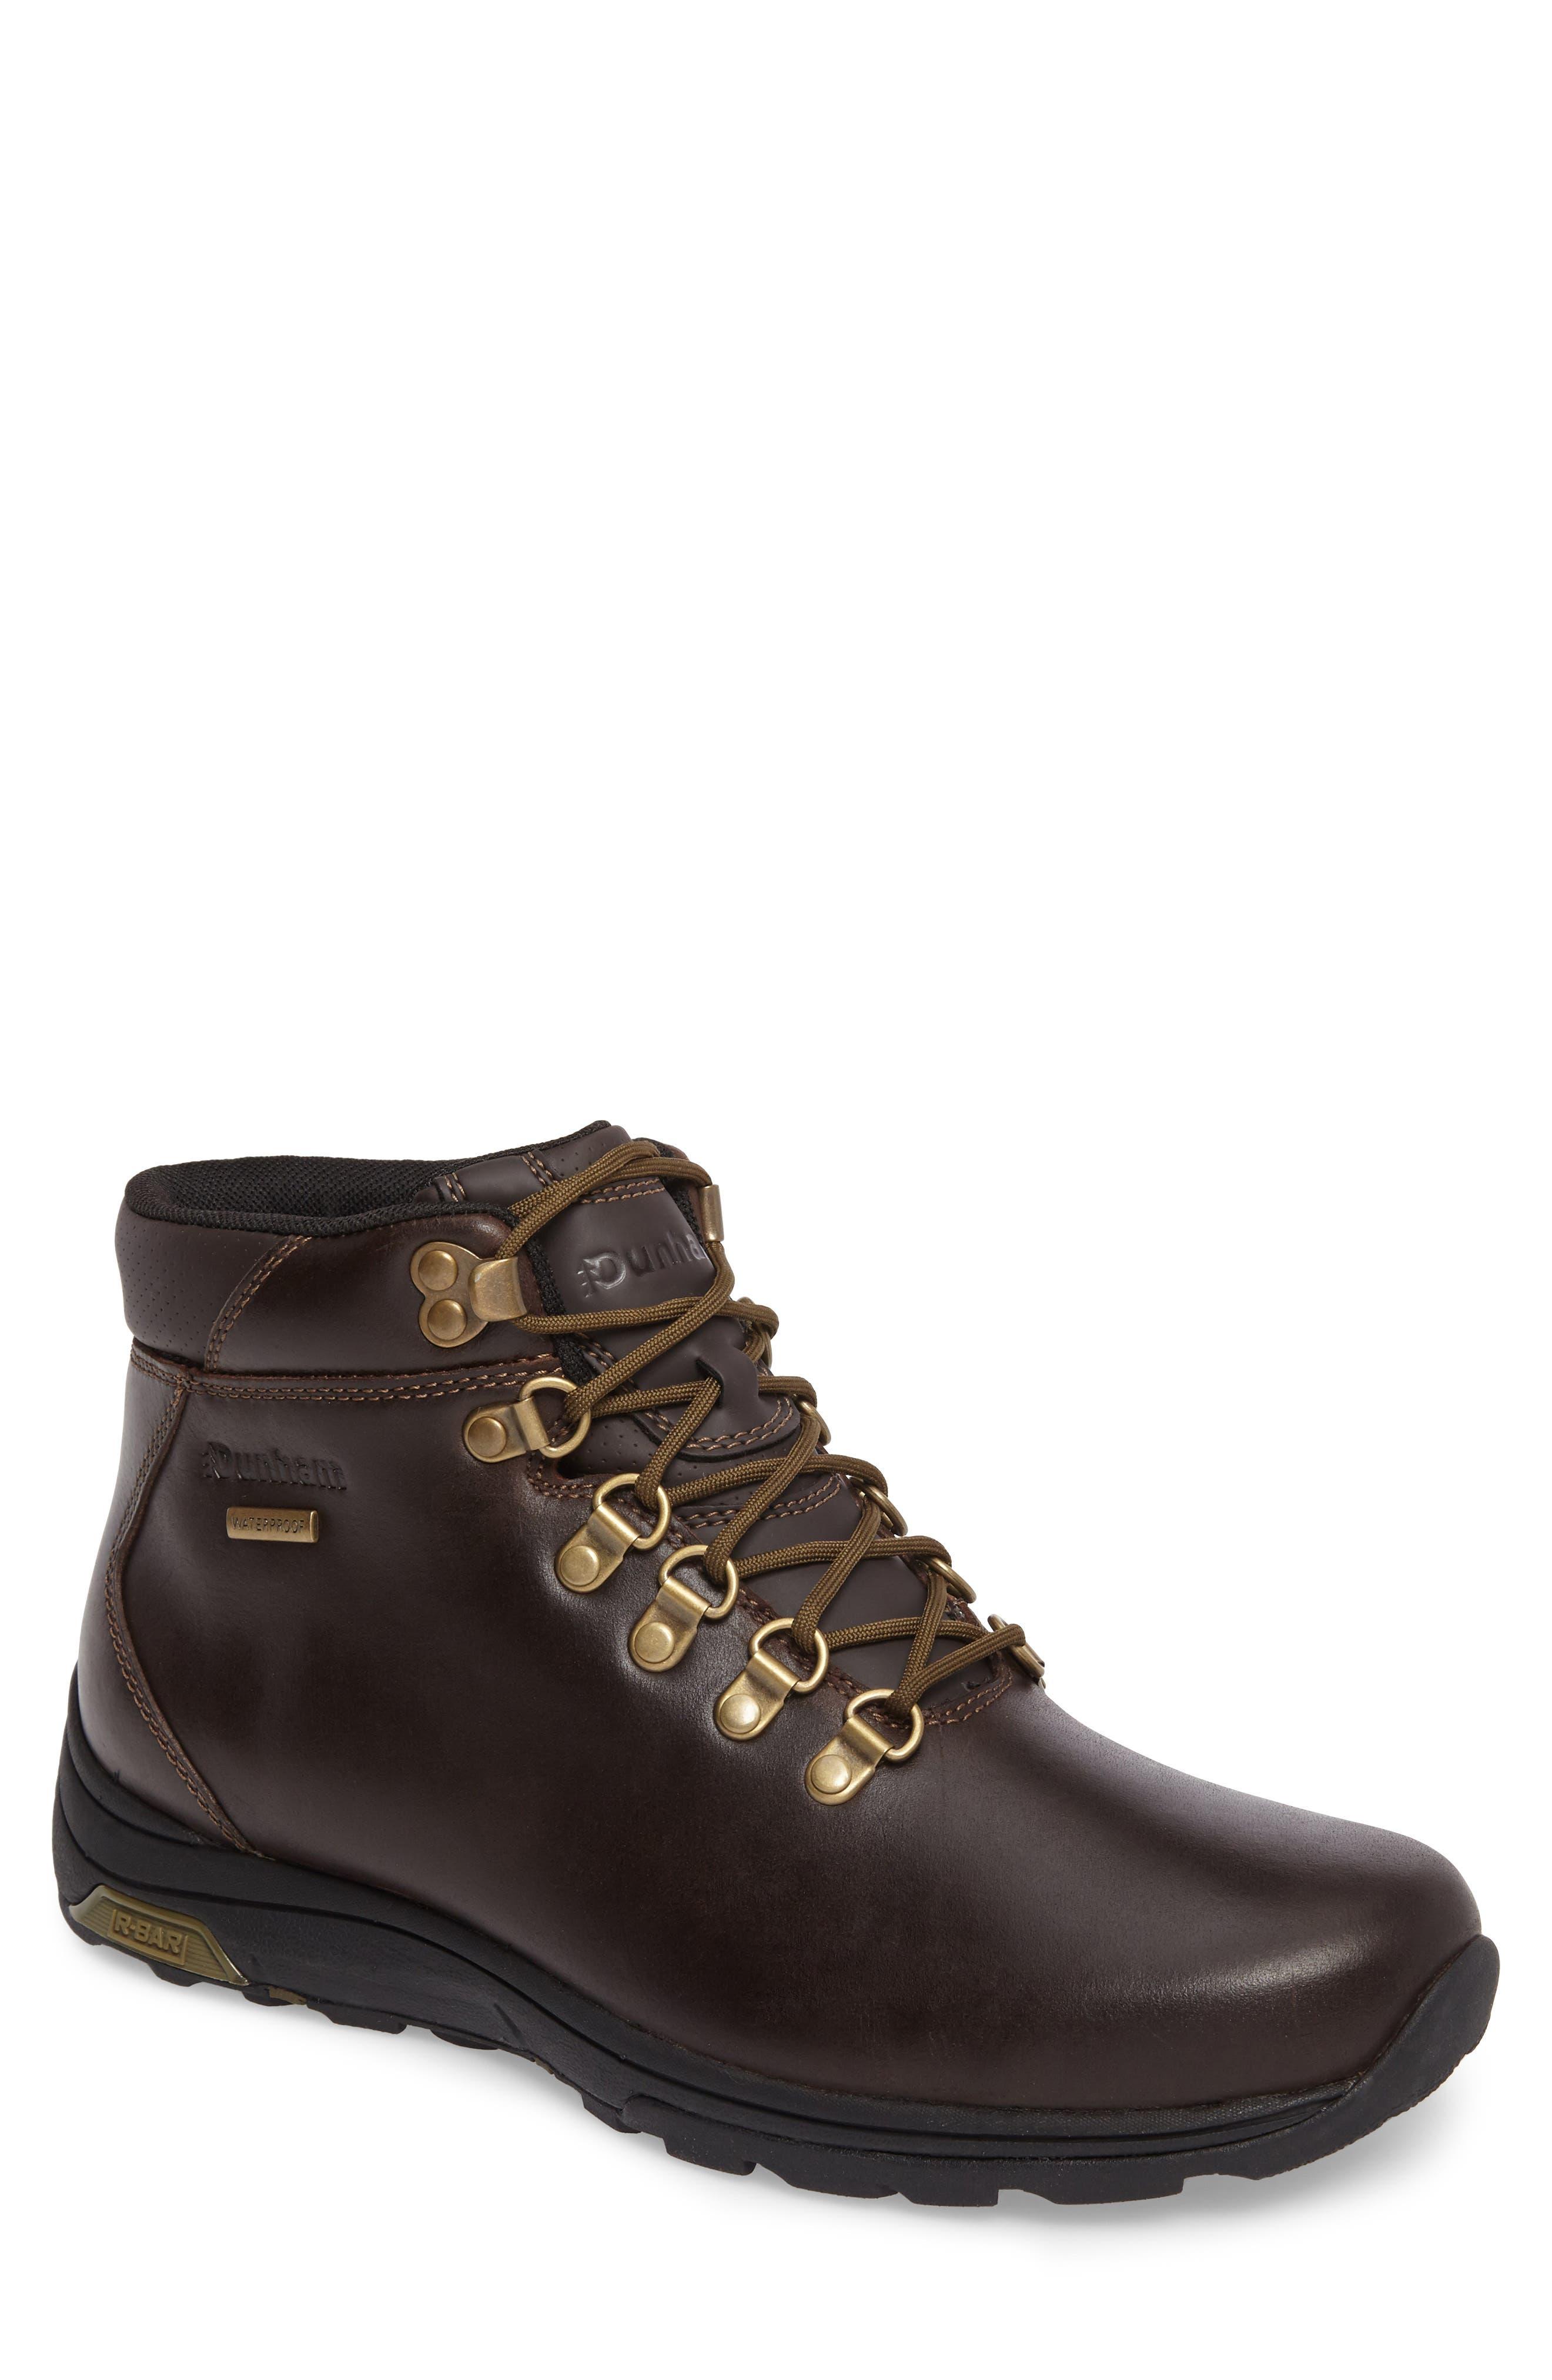 Trukka Waterproof Boot,                         Main,                         color, Brown